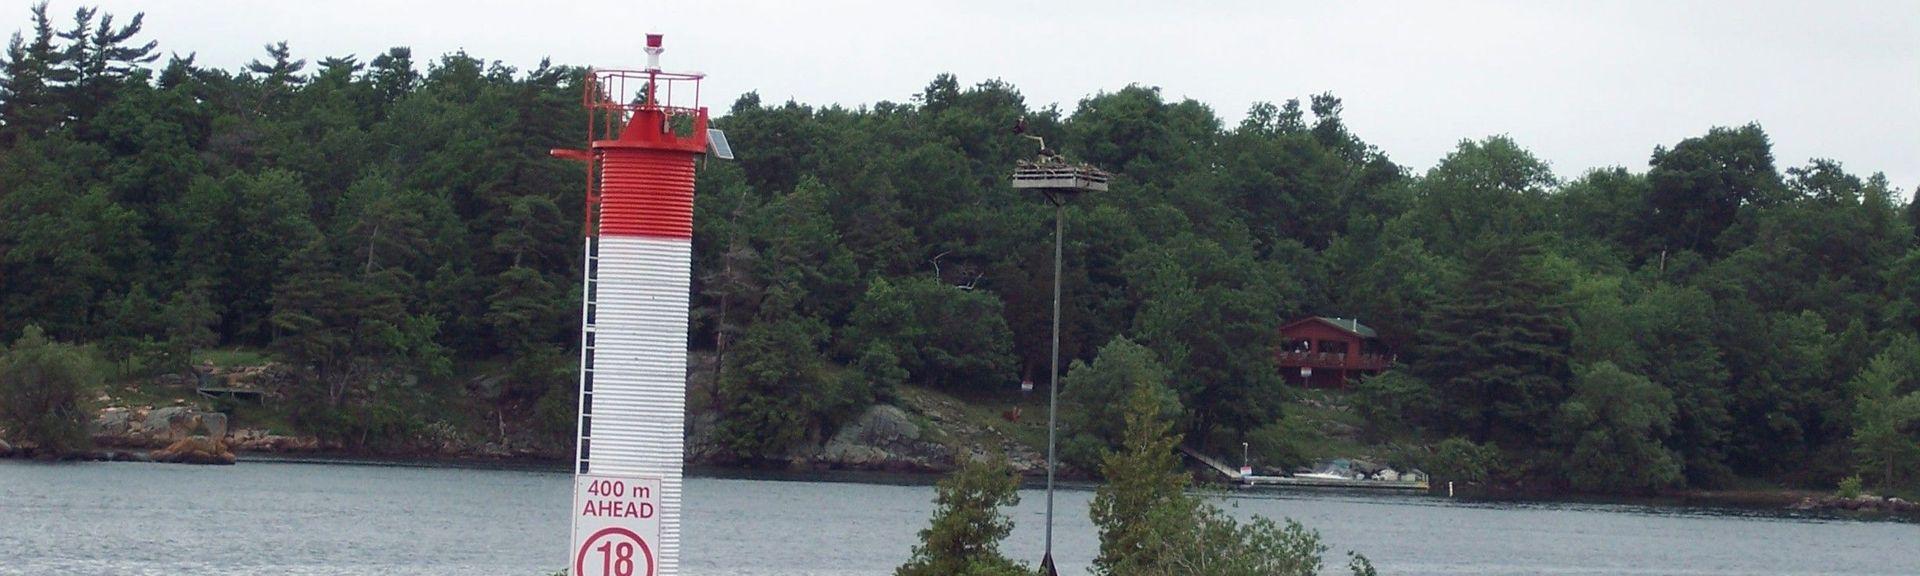 Île Wolfe, Ontario, Canada